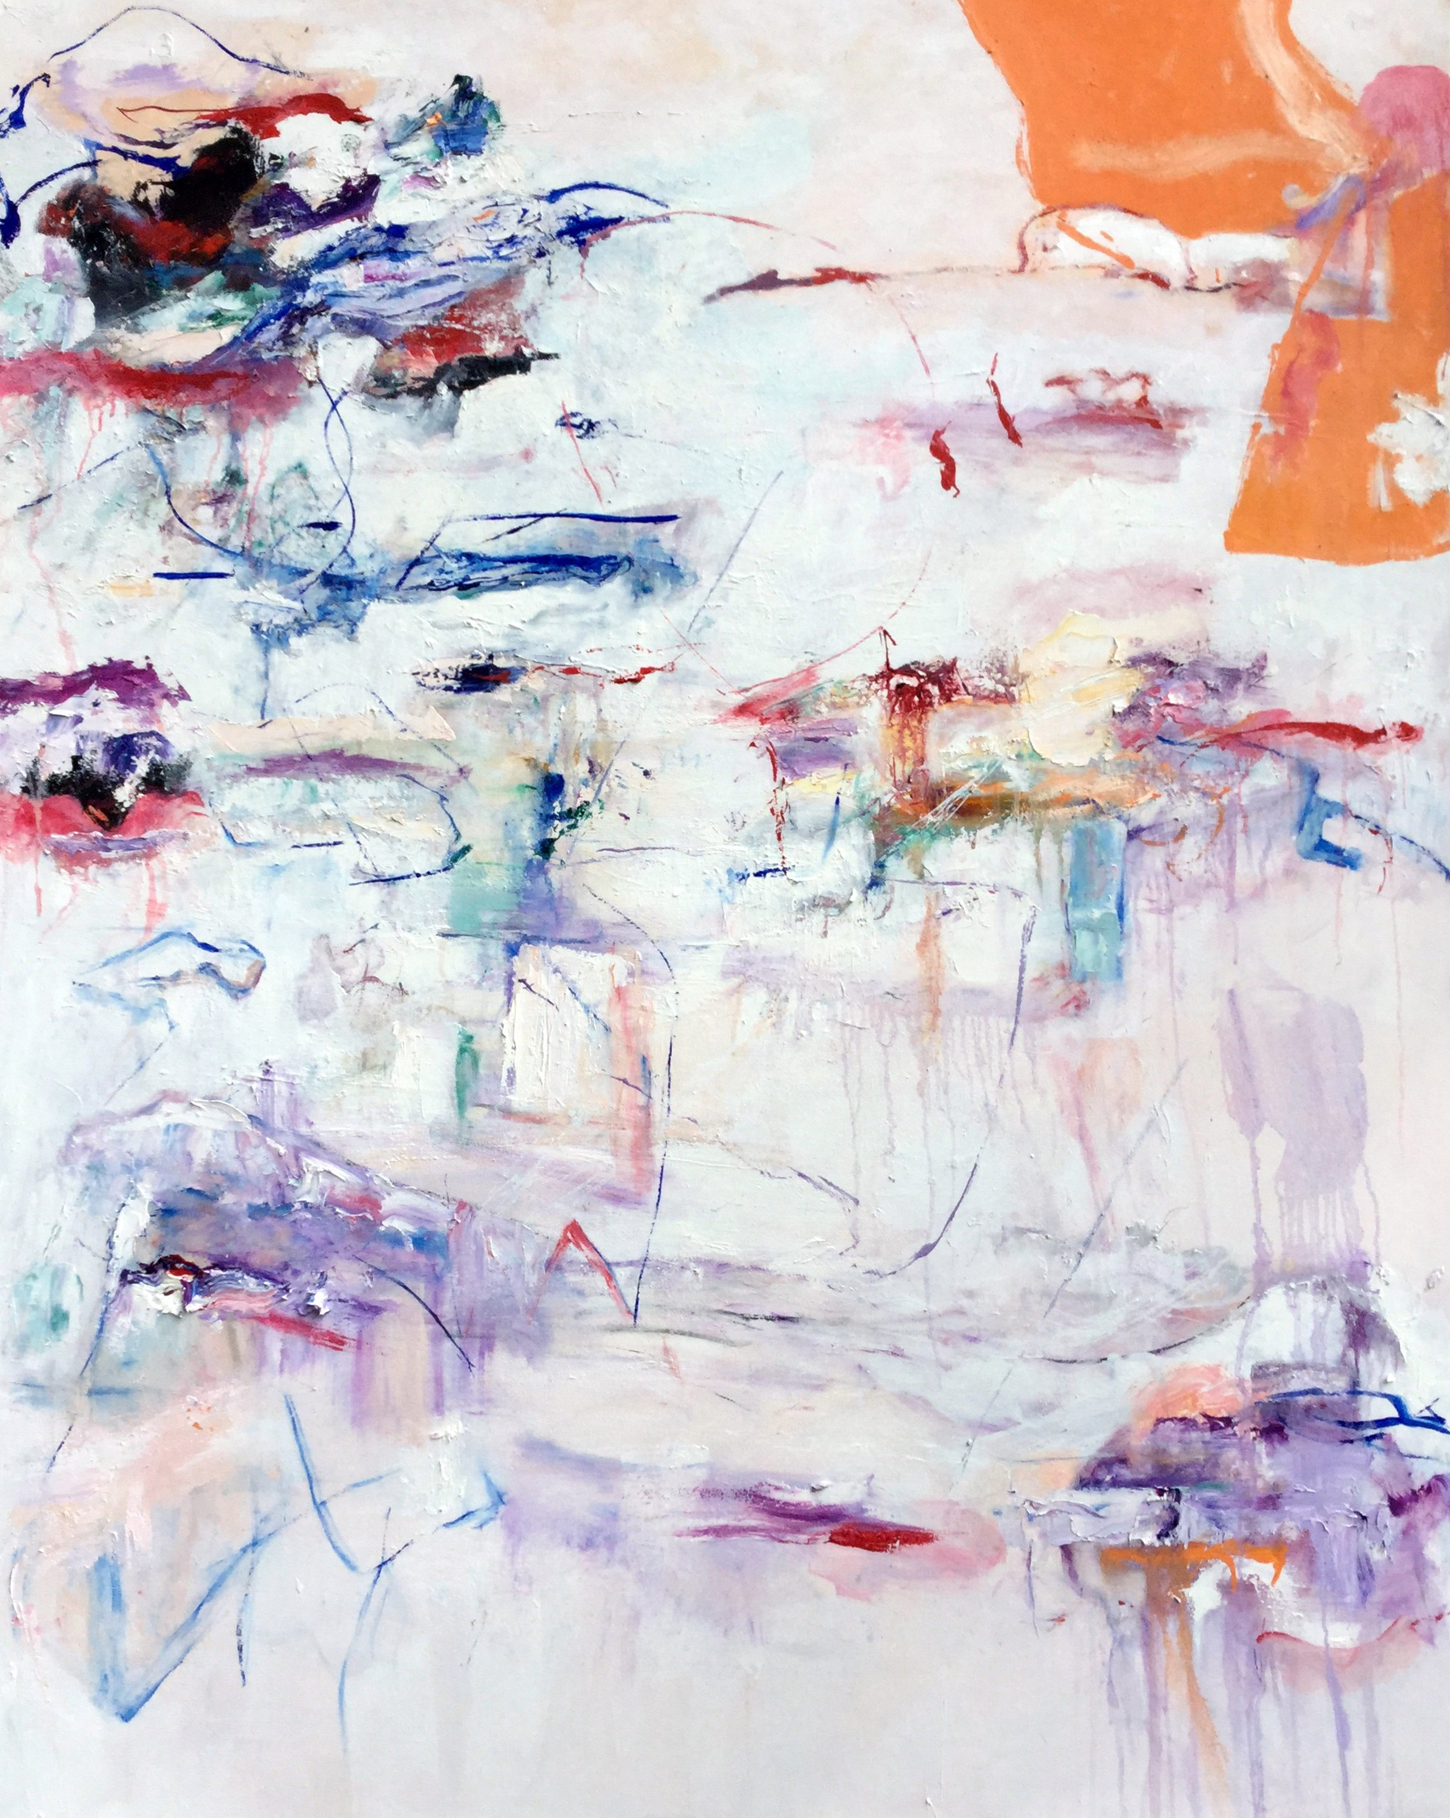 Katherine Borkowski-Byrne,  Notes to Myself , Oil on canvas, 60x48